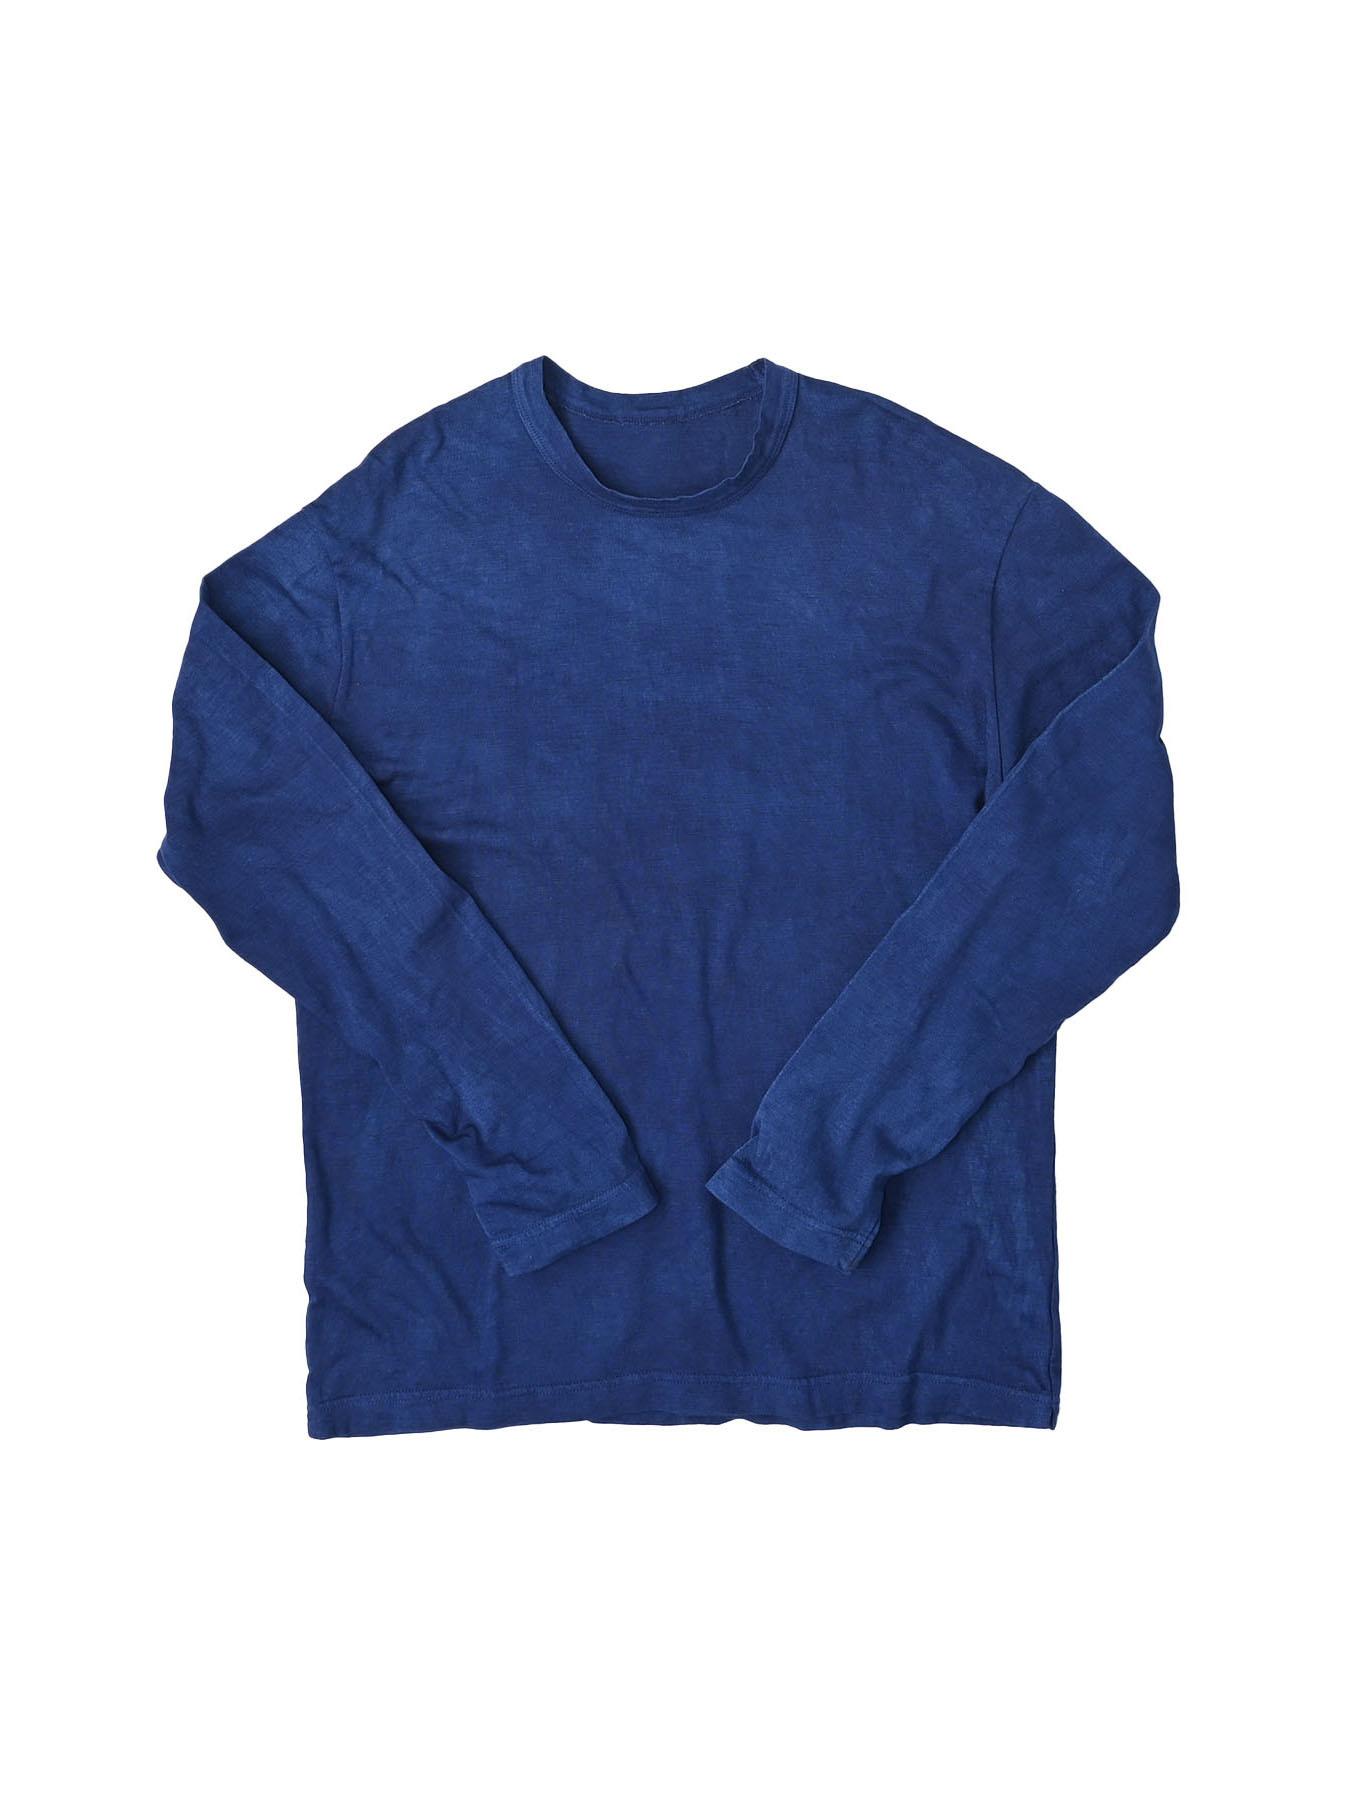 Ai Organic Supima Tenjiku Long-sleeved T-shirt-1